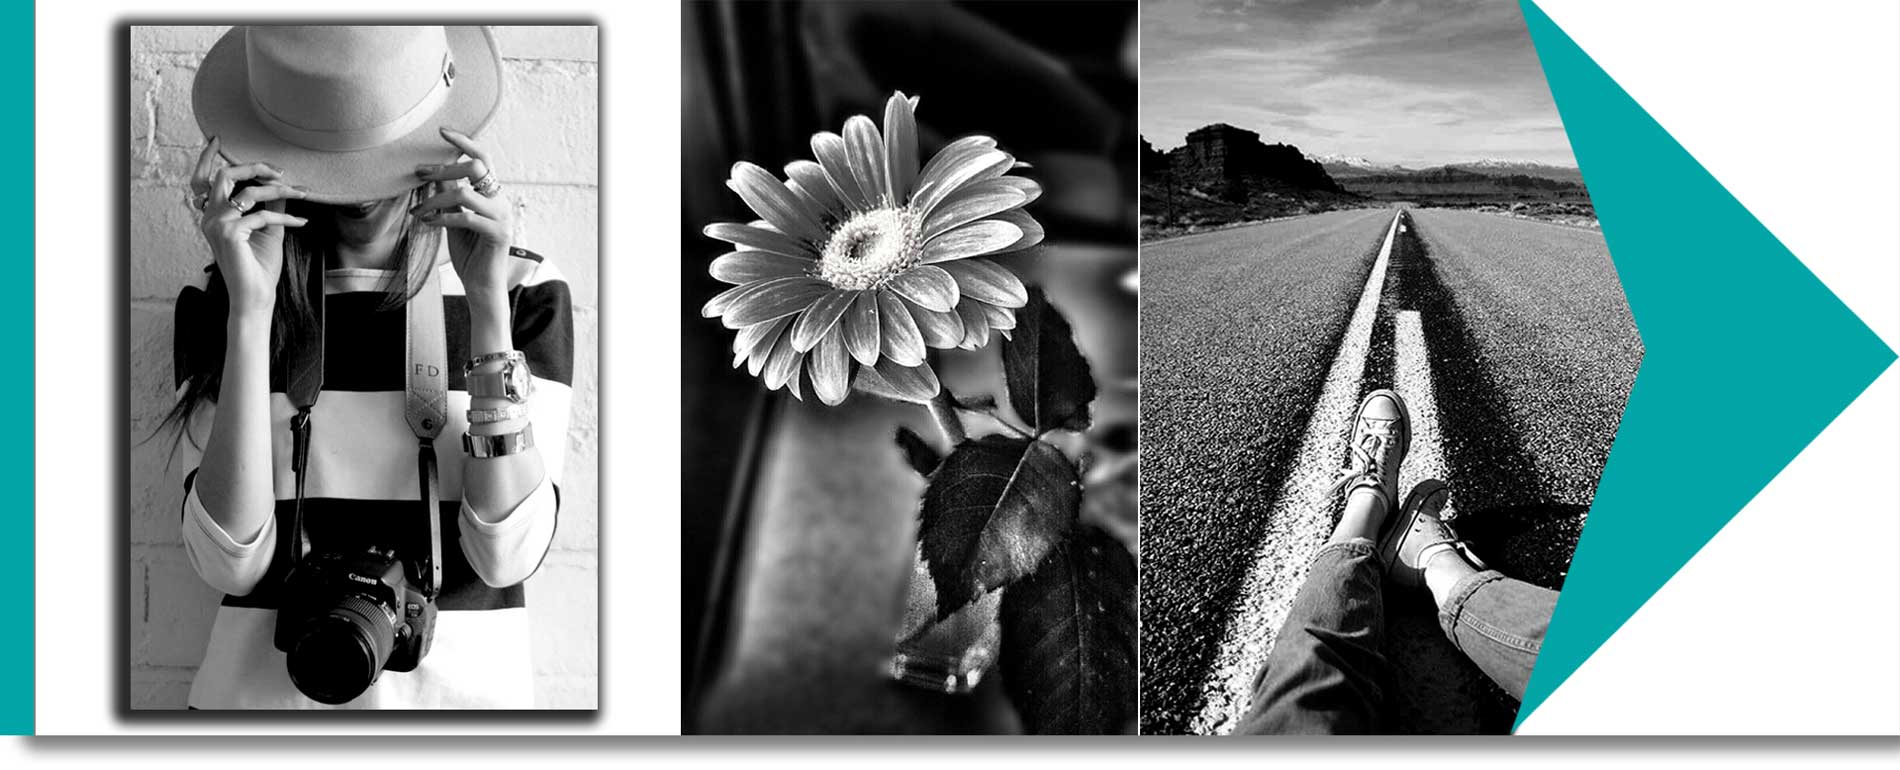 f Stunning Black and Whites 3 - ویژگی عکس های سیاه و سفید کدامند و چگونه میتوان به آنها دست یافت ؟